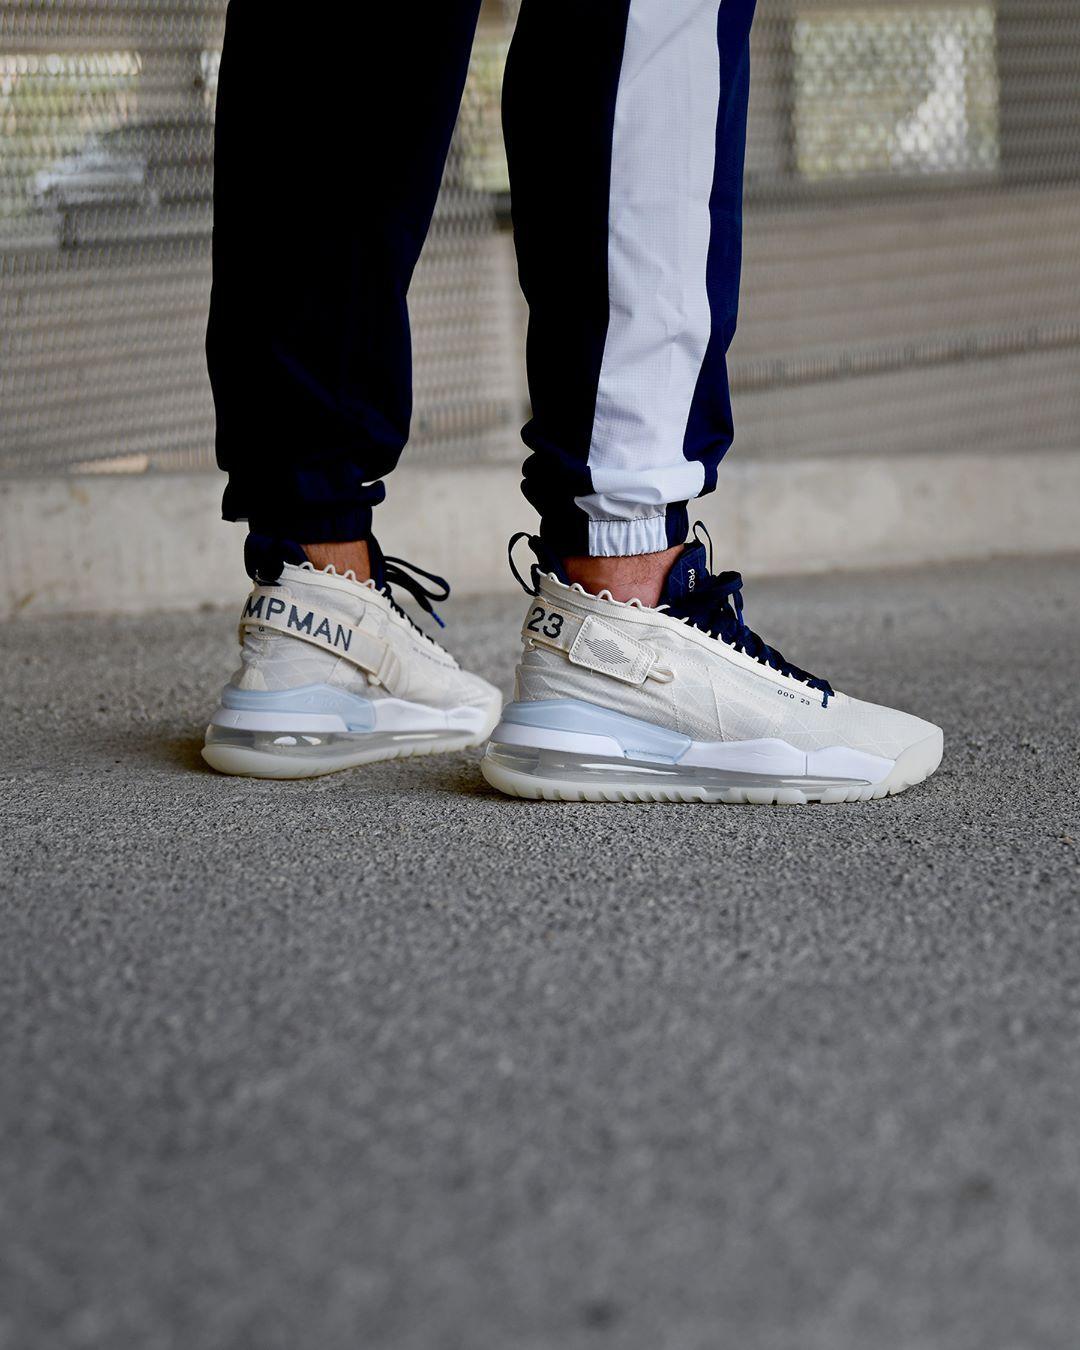 nike jordan proto-max 720 zapatillas